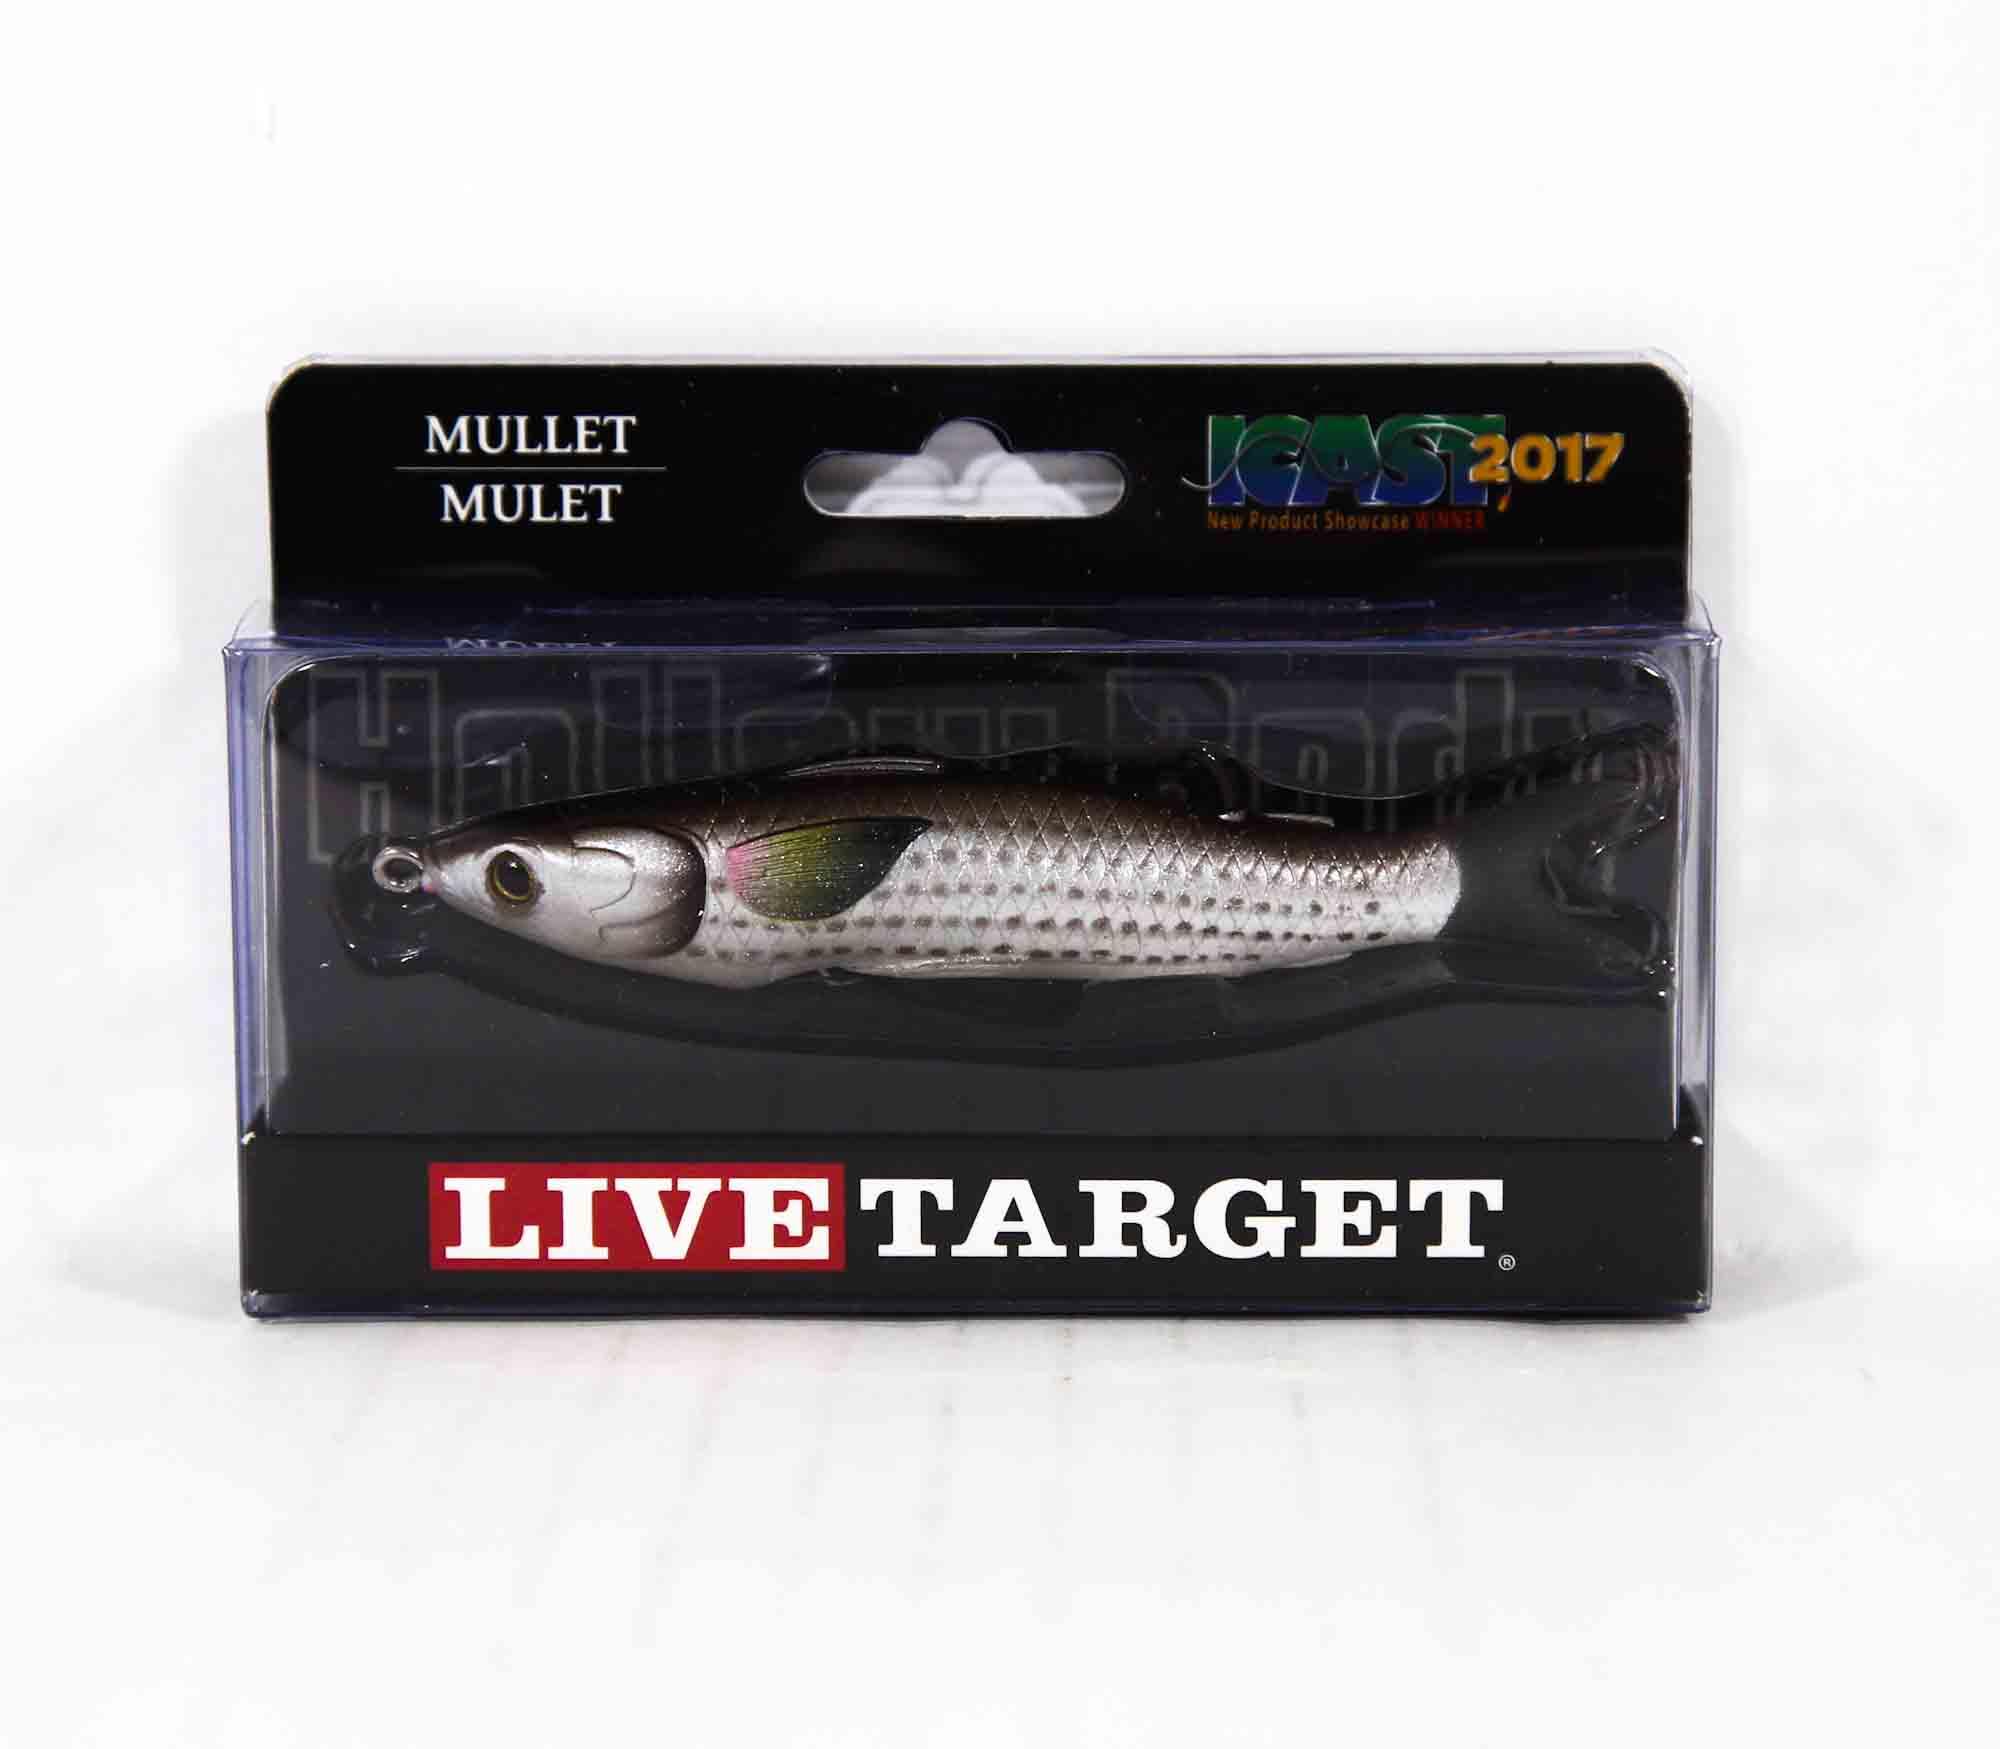 Live Target MUH95T723 Mullet Walking Bait 3.75 Inch Natural Brown (0453)